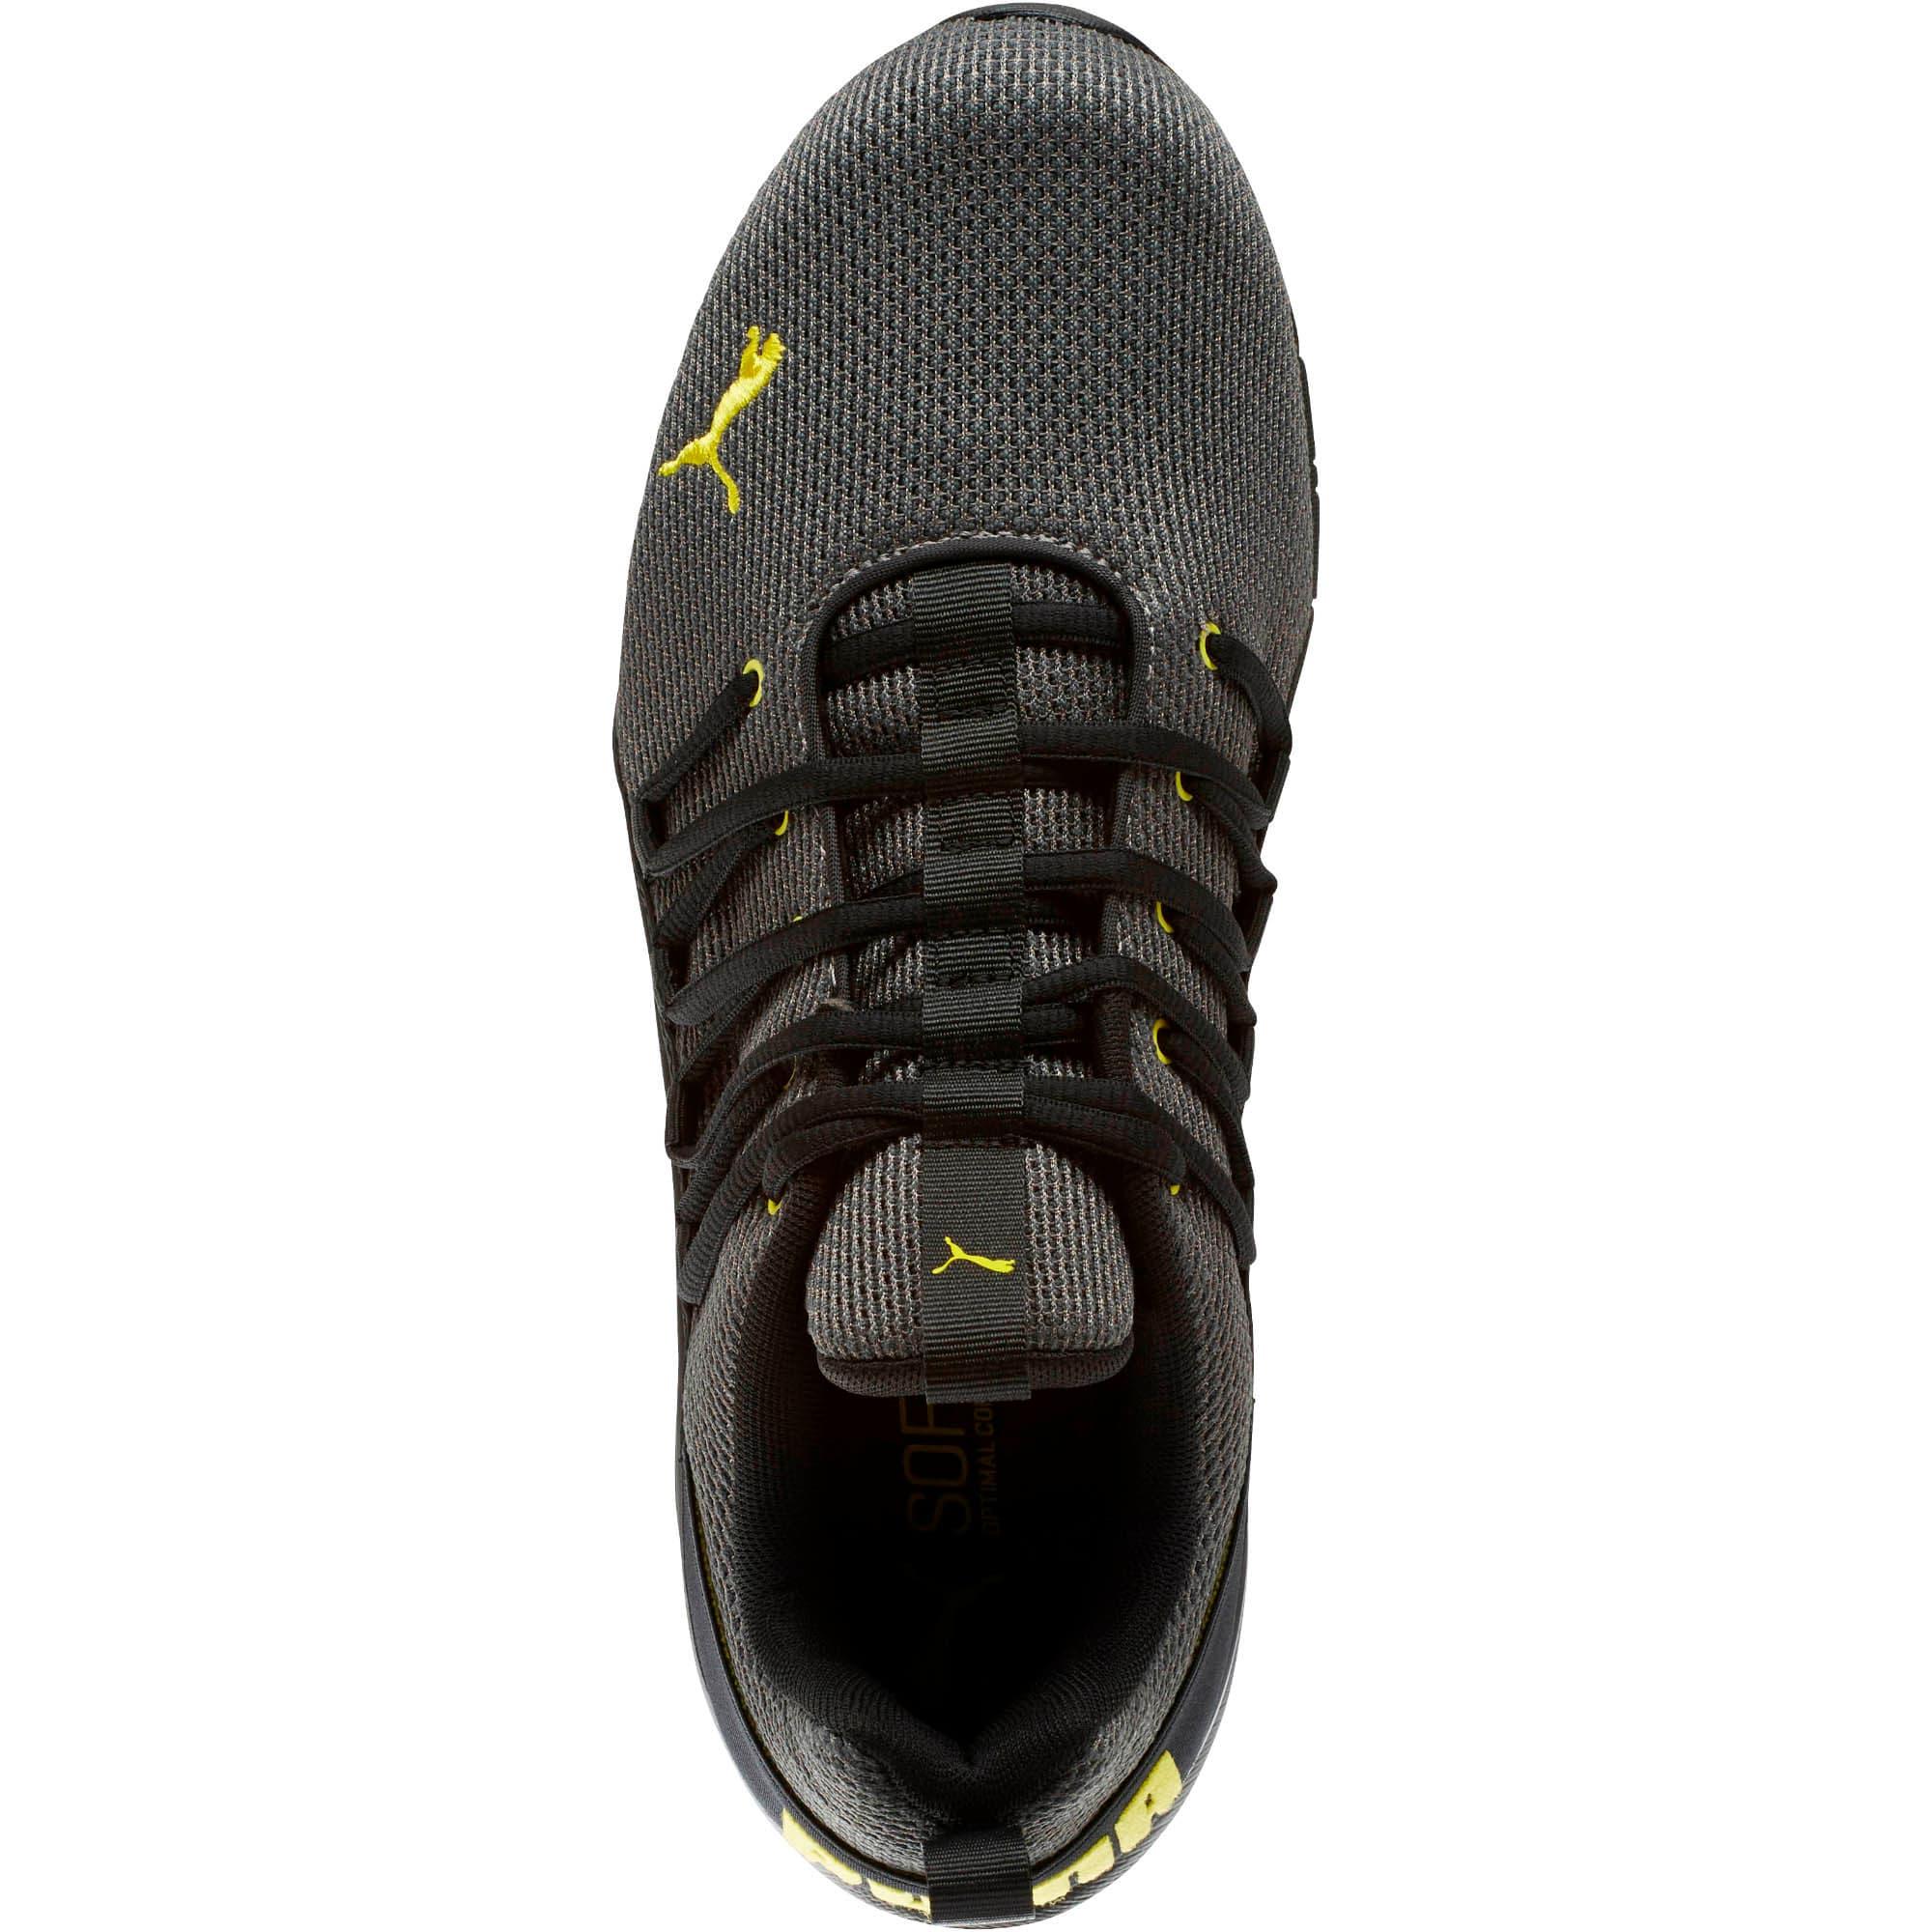 Thumbnail 5 of Axelion Mesh Men's Training Shoes, Charcoal Gray-Blazing Yellow, medium